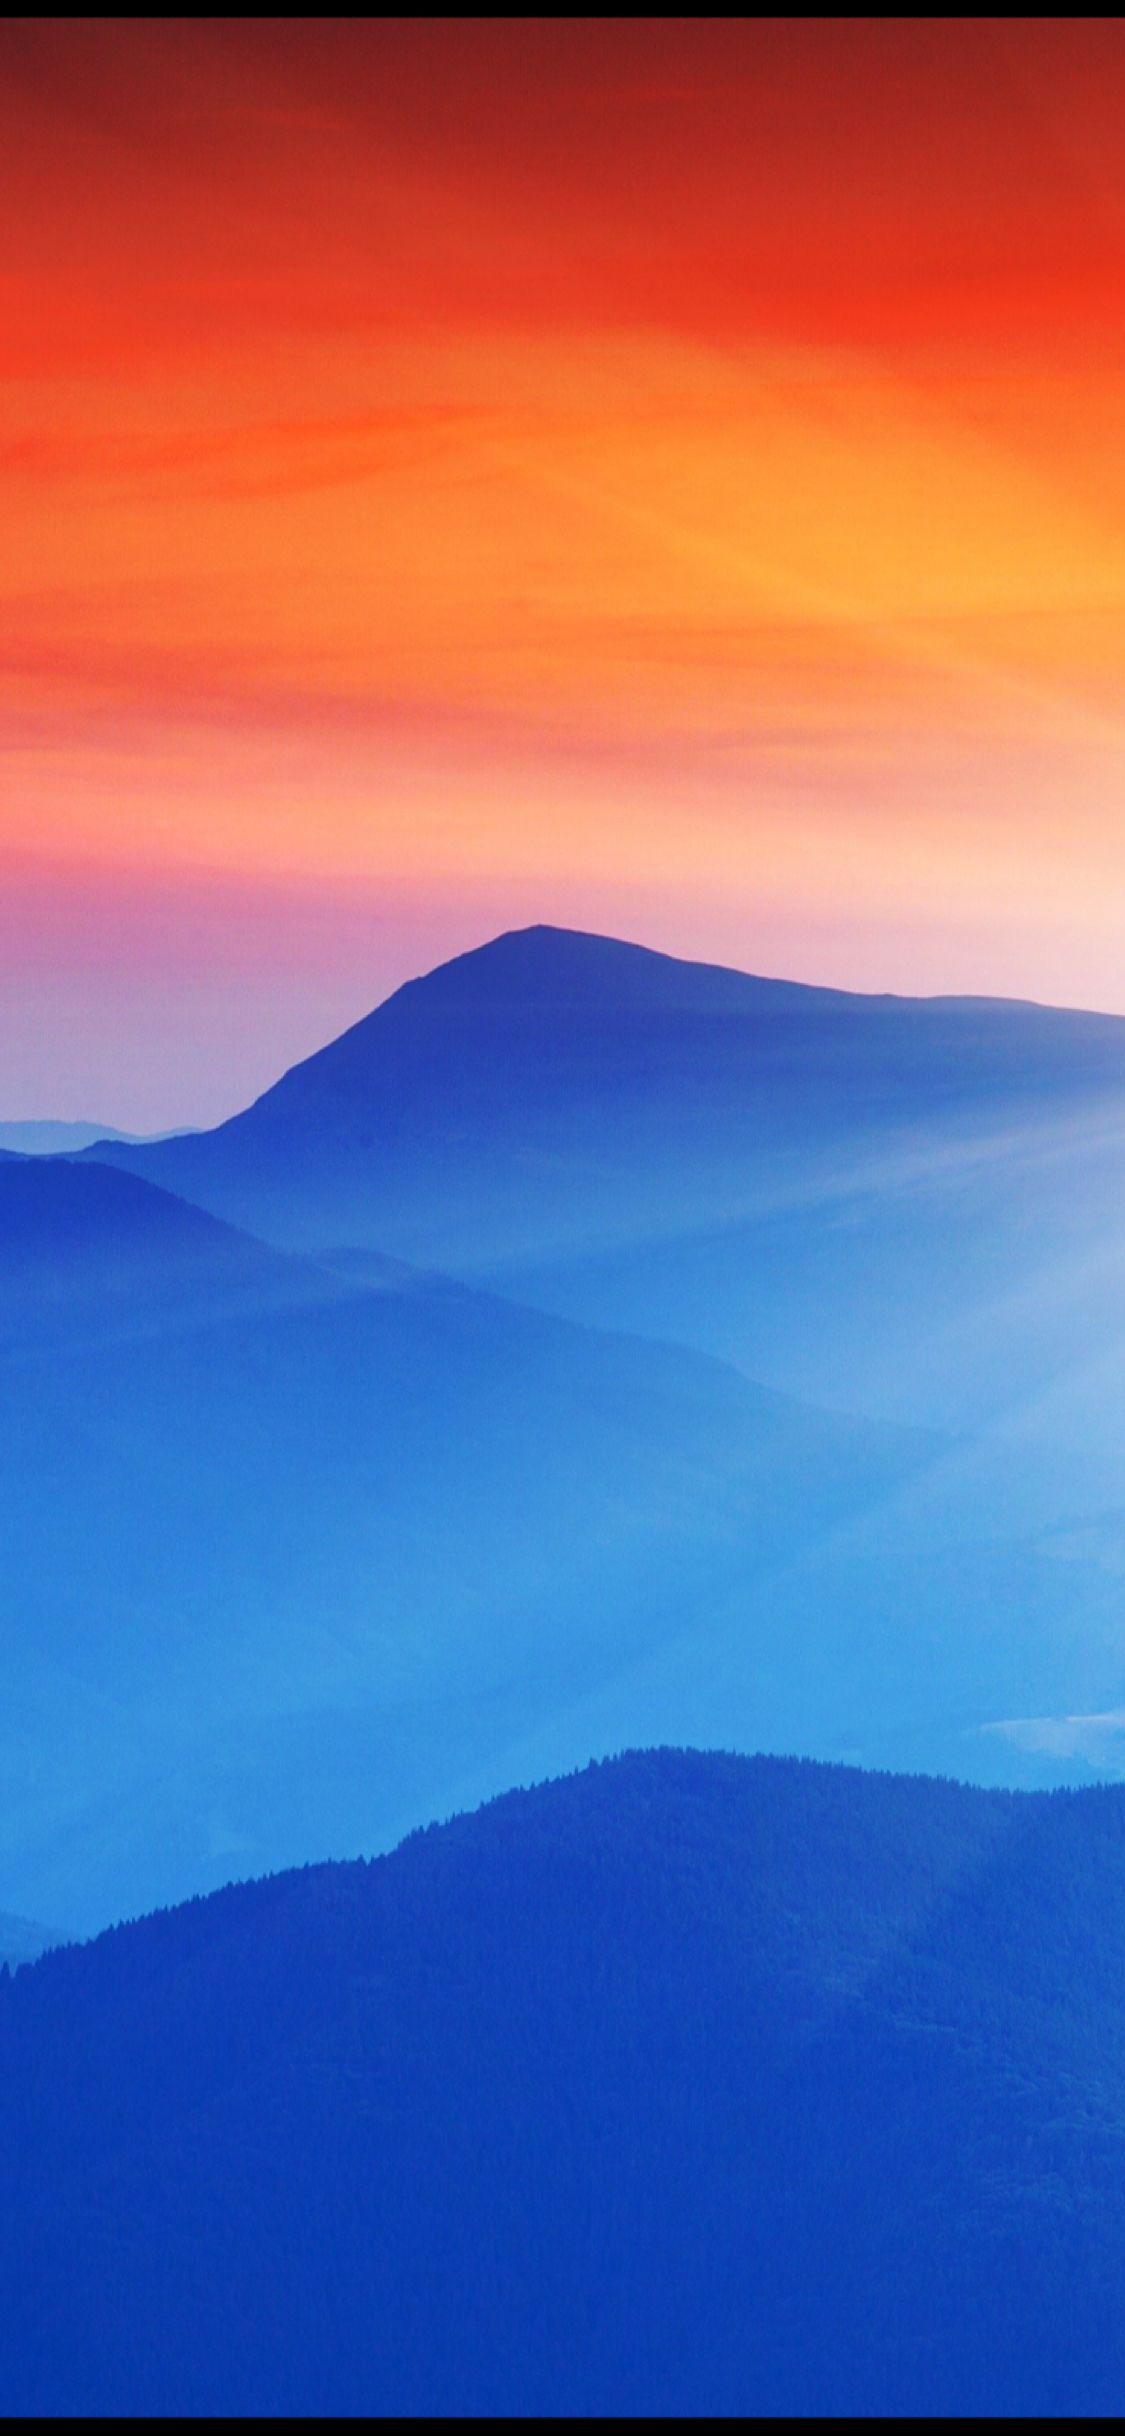 Blue mountain and orange sky Orange sky, Iphone